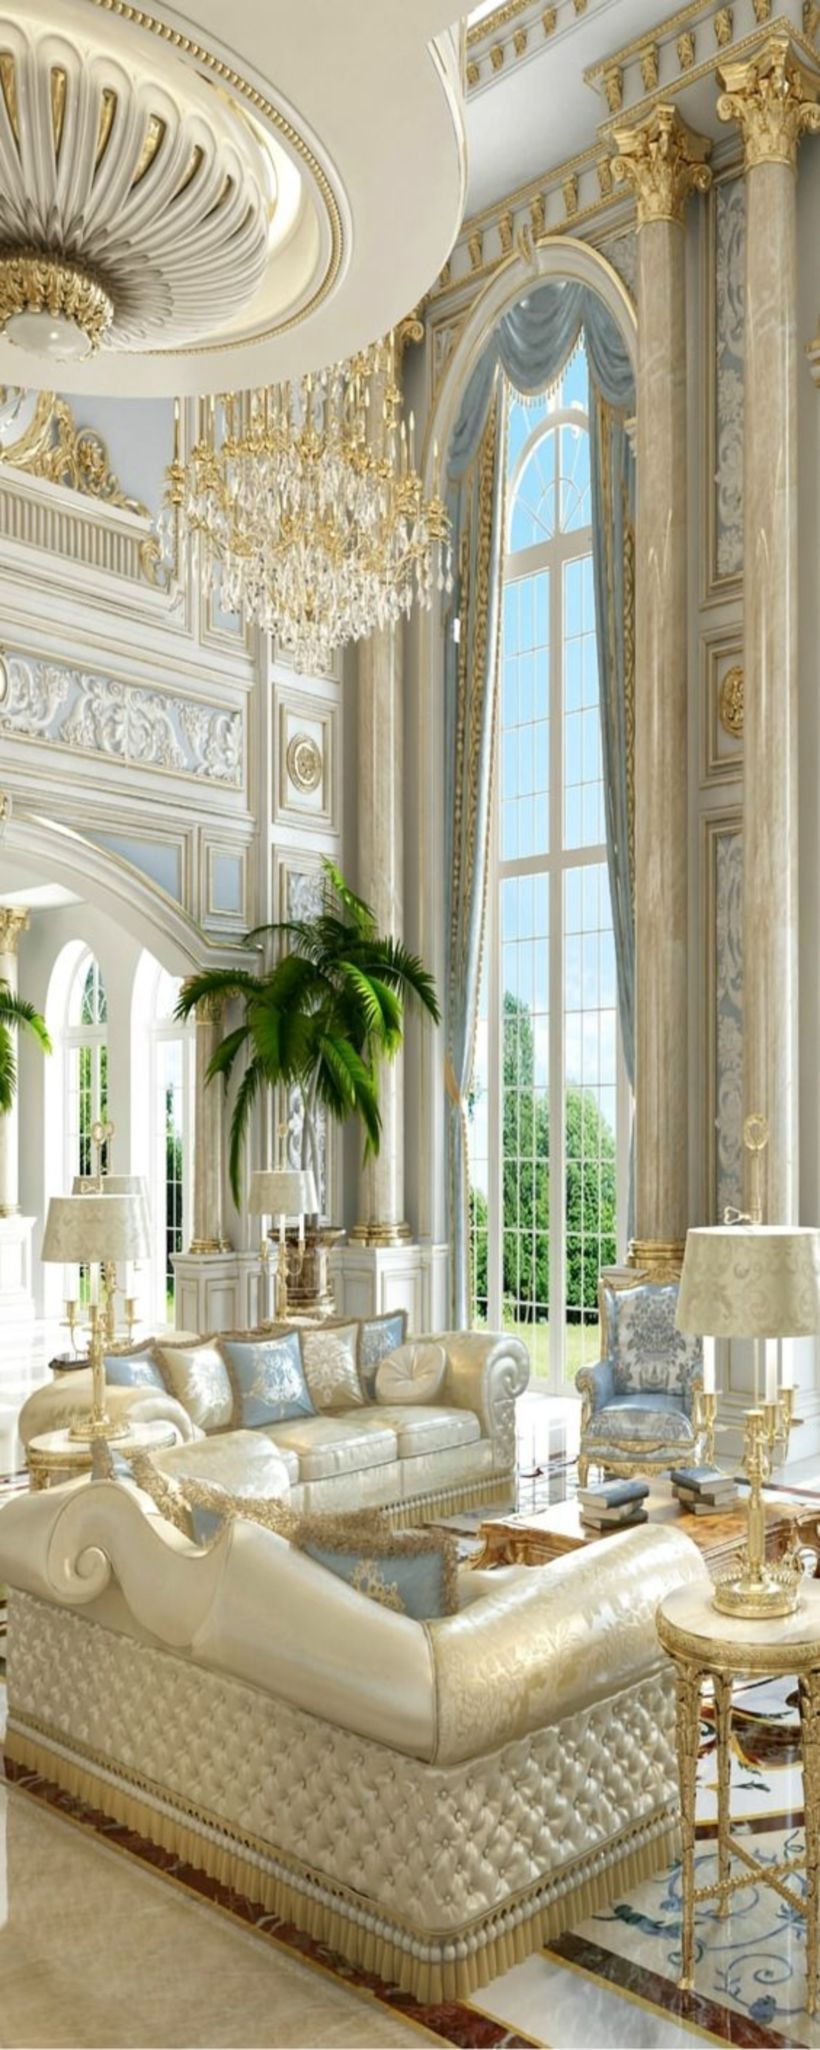 Breathtaking elegant and luxury living room decoration